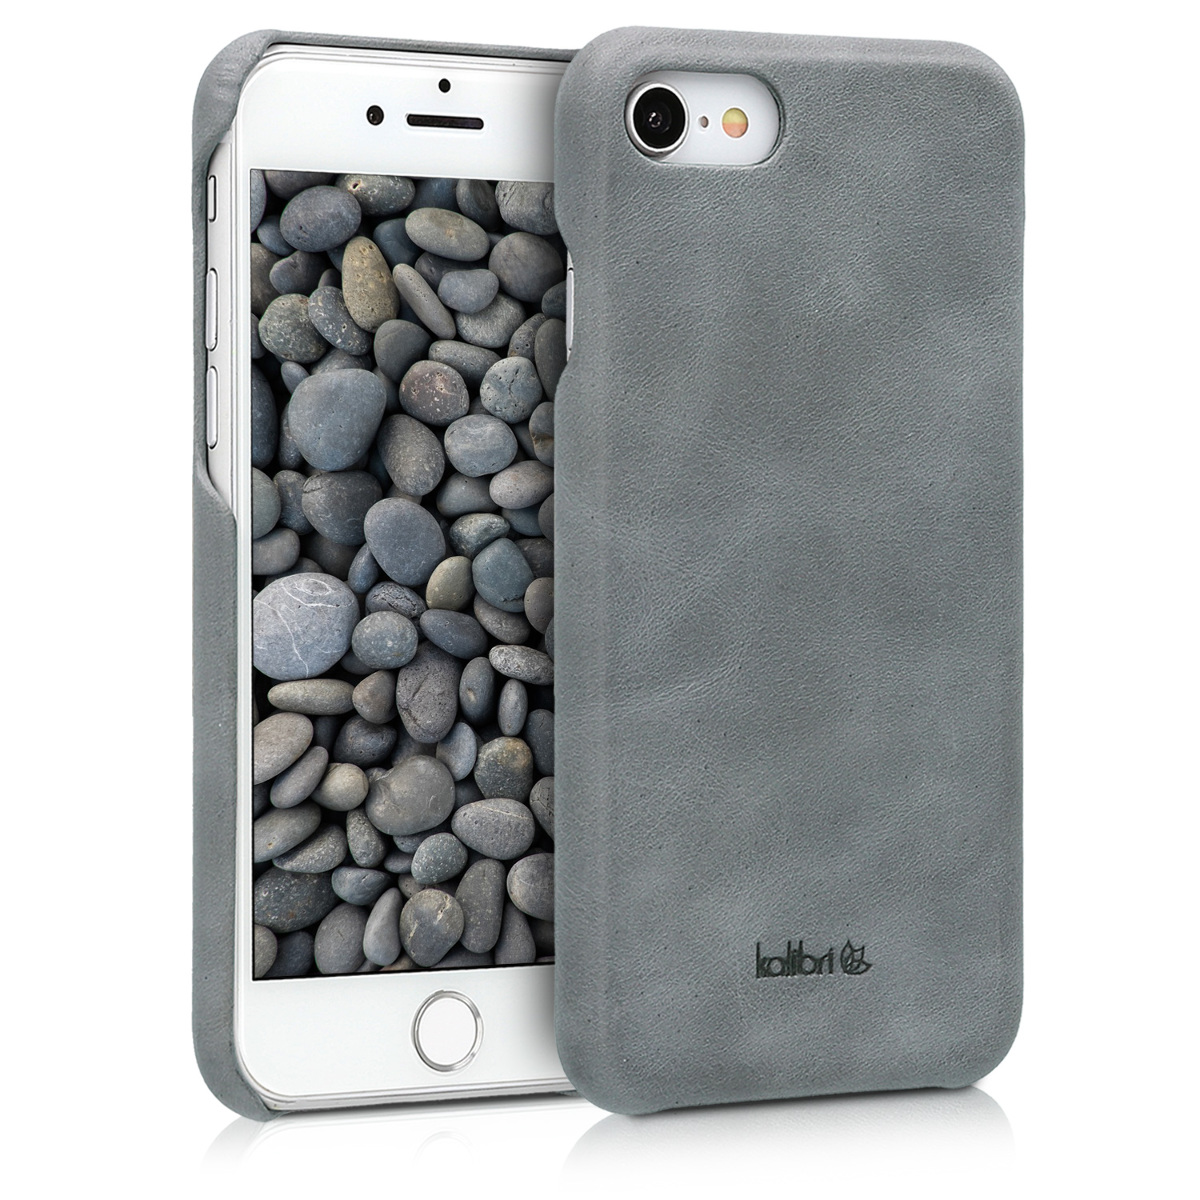 Kalibri Σκληρή Δερμάτινη Θήκη iPhone 7 / 8 - Dark Grey (39345.19)